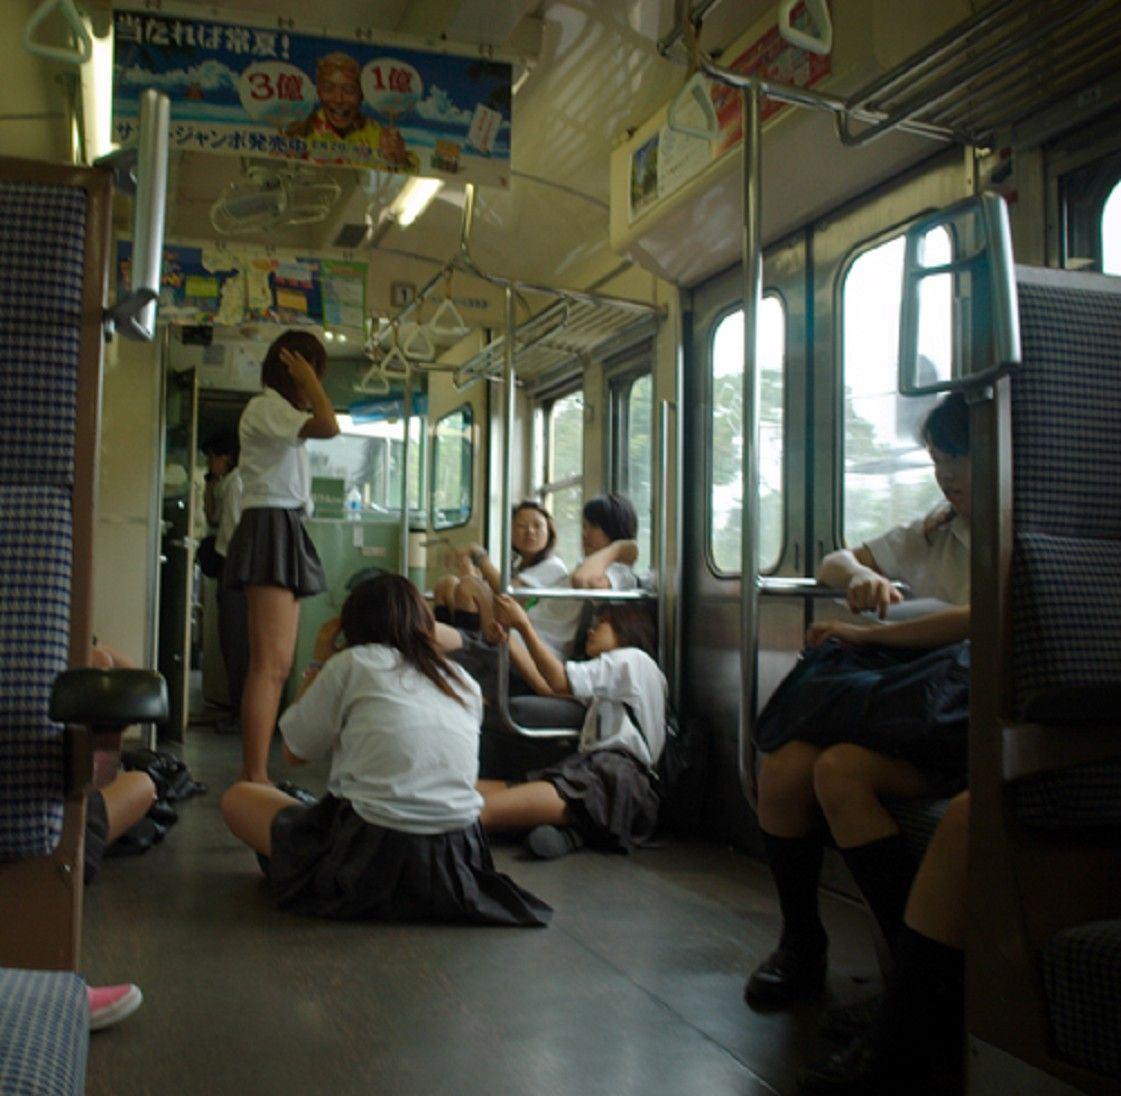 【JKおふざけエロ画像】これがゆとり世代か…学校の外でもこの通り下品すぎる女子高生のおふざけエロ画像 その8